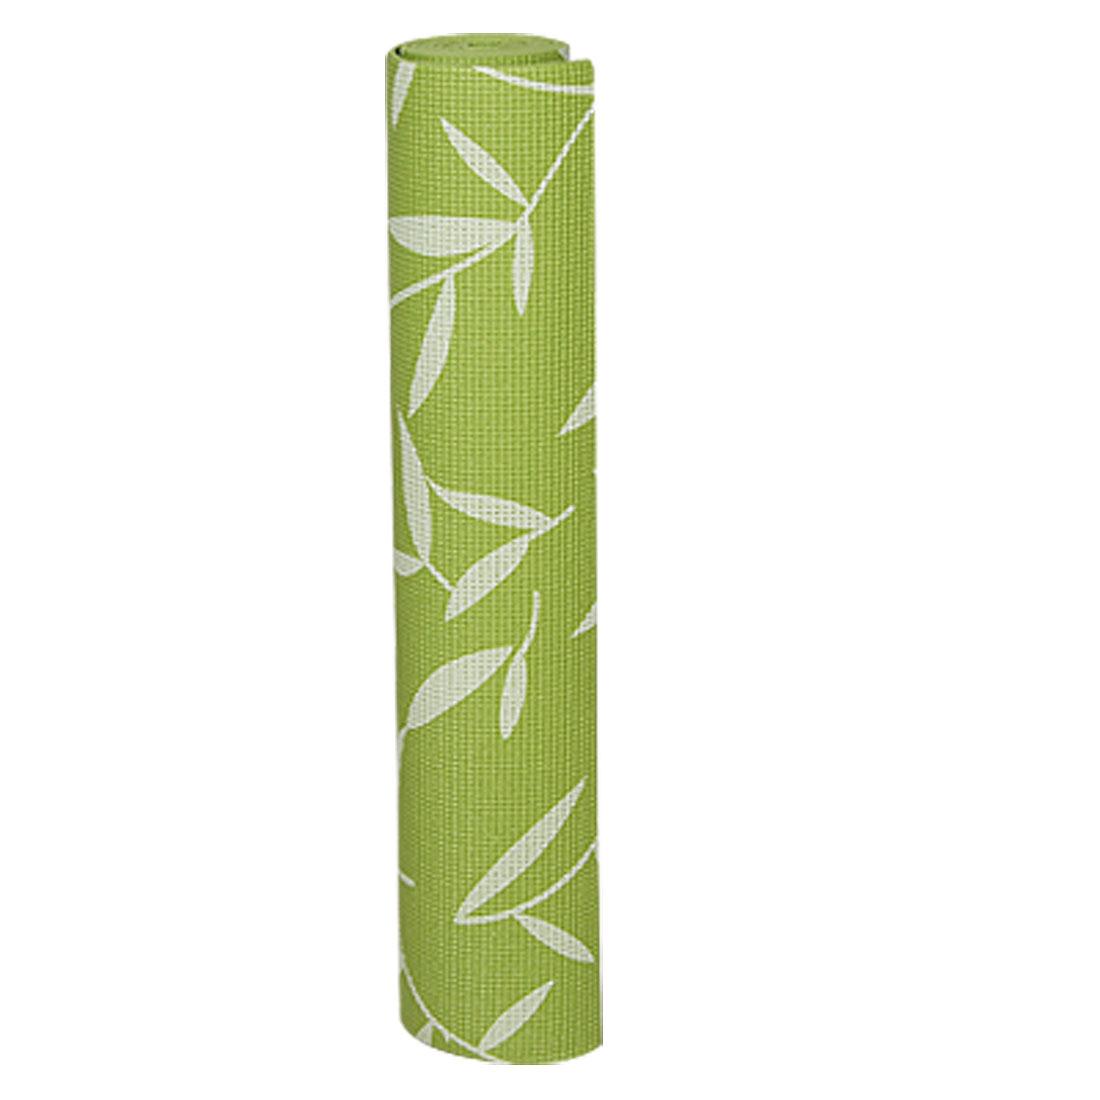 "68"" x 24"" x 1/5"" Olive Green PVC Leaf Print Nonslip Mat Cushion for Yoga"